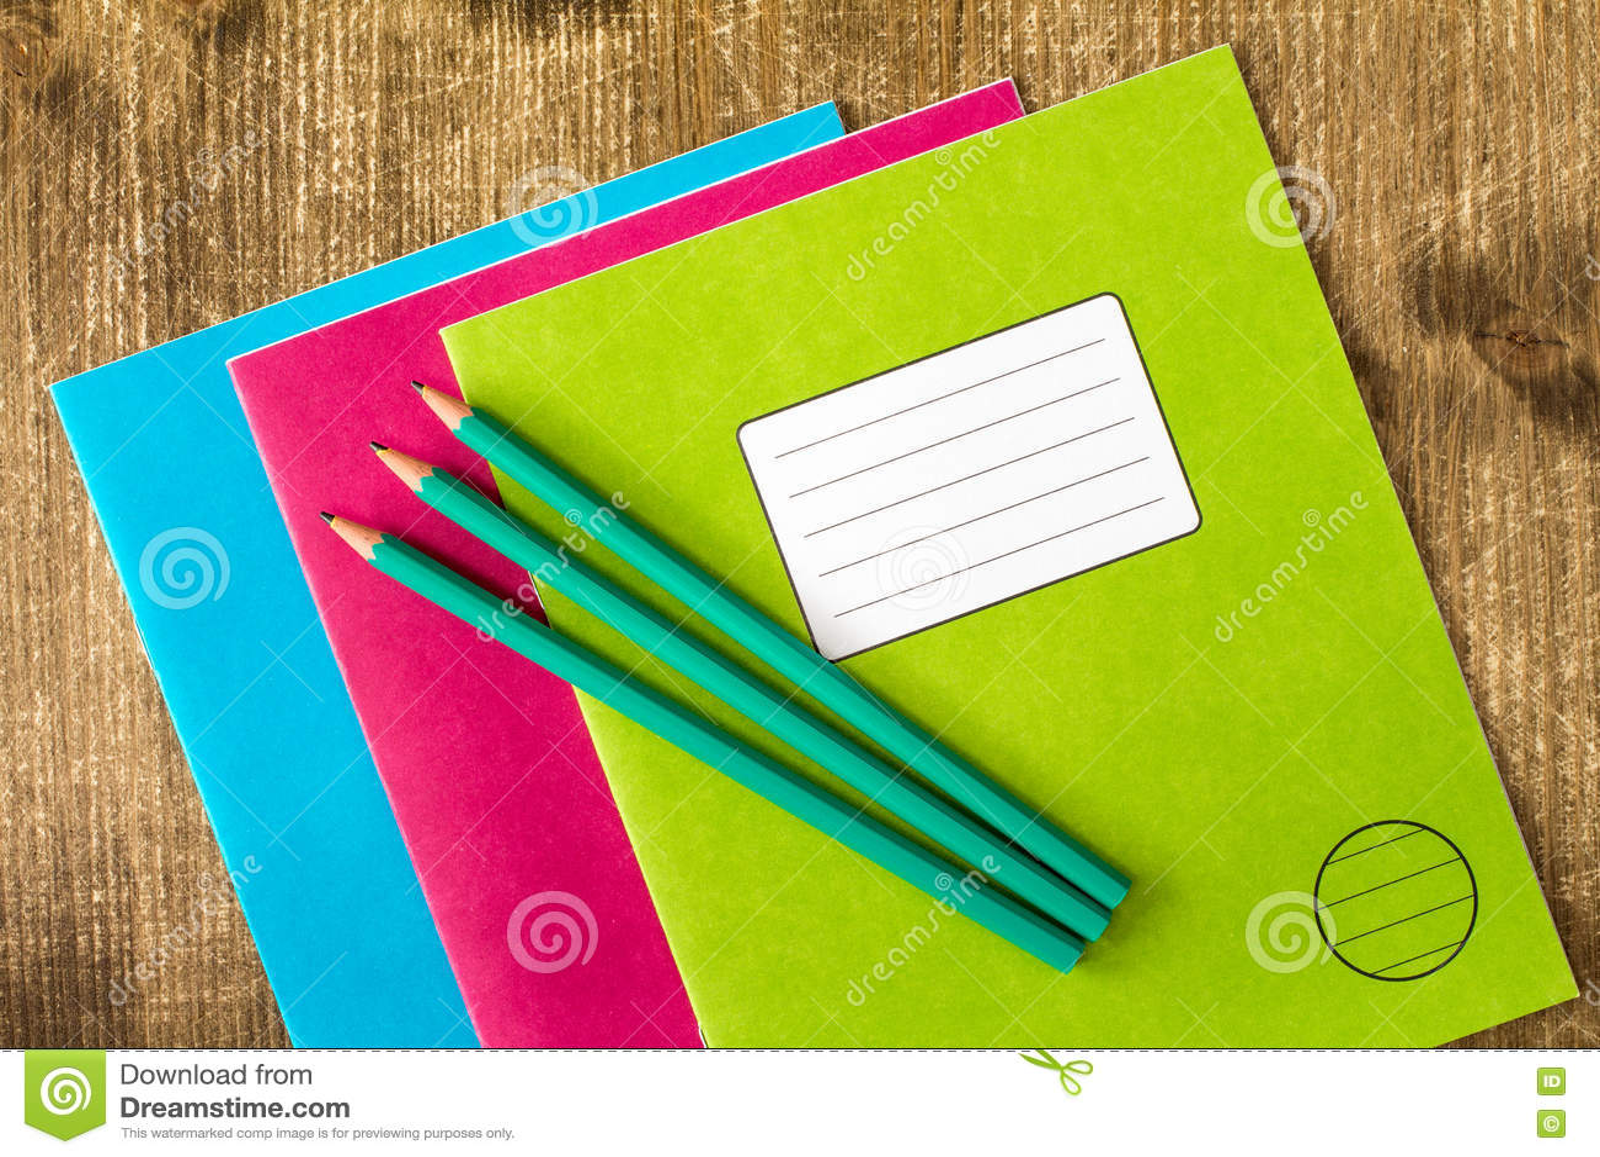 Three Exercise Books And Three Pencils Stock Photo - Image